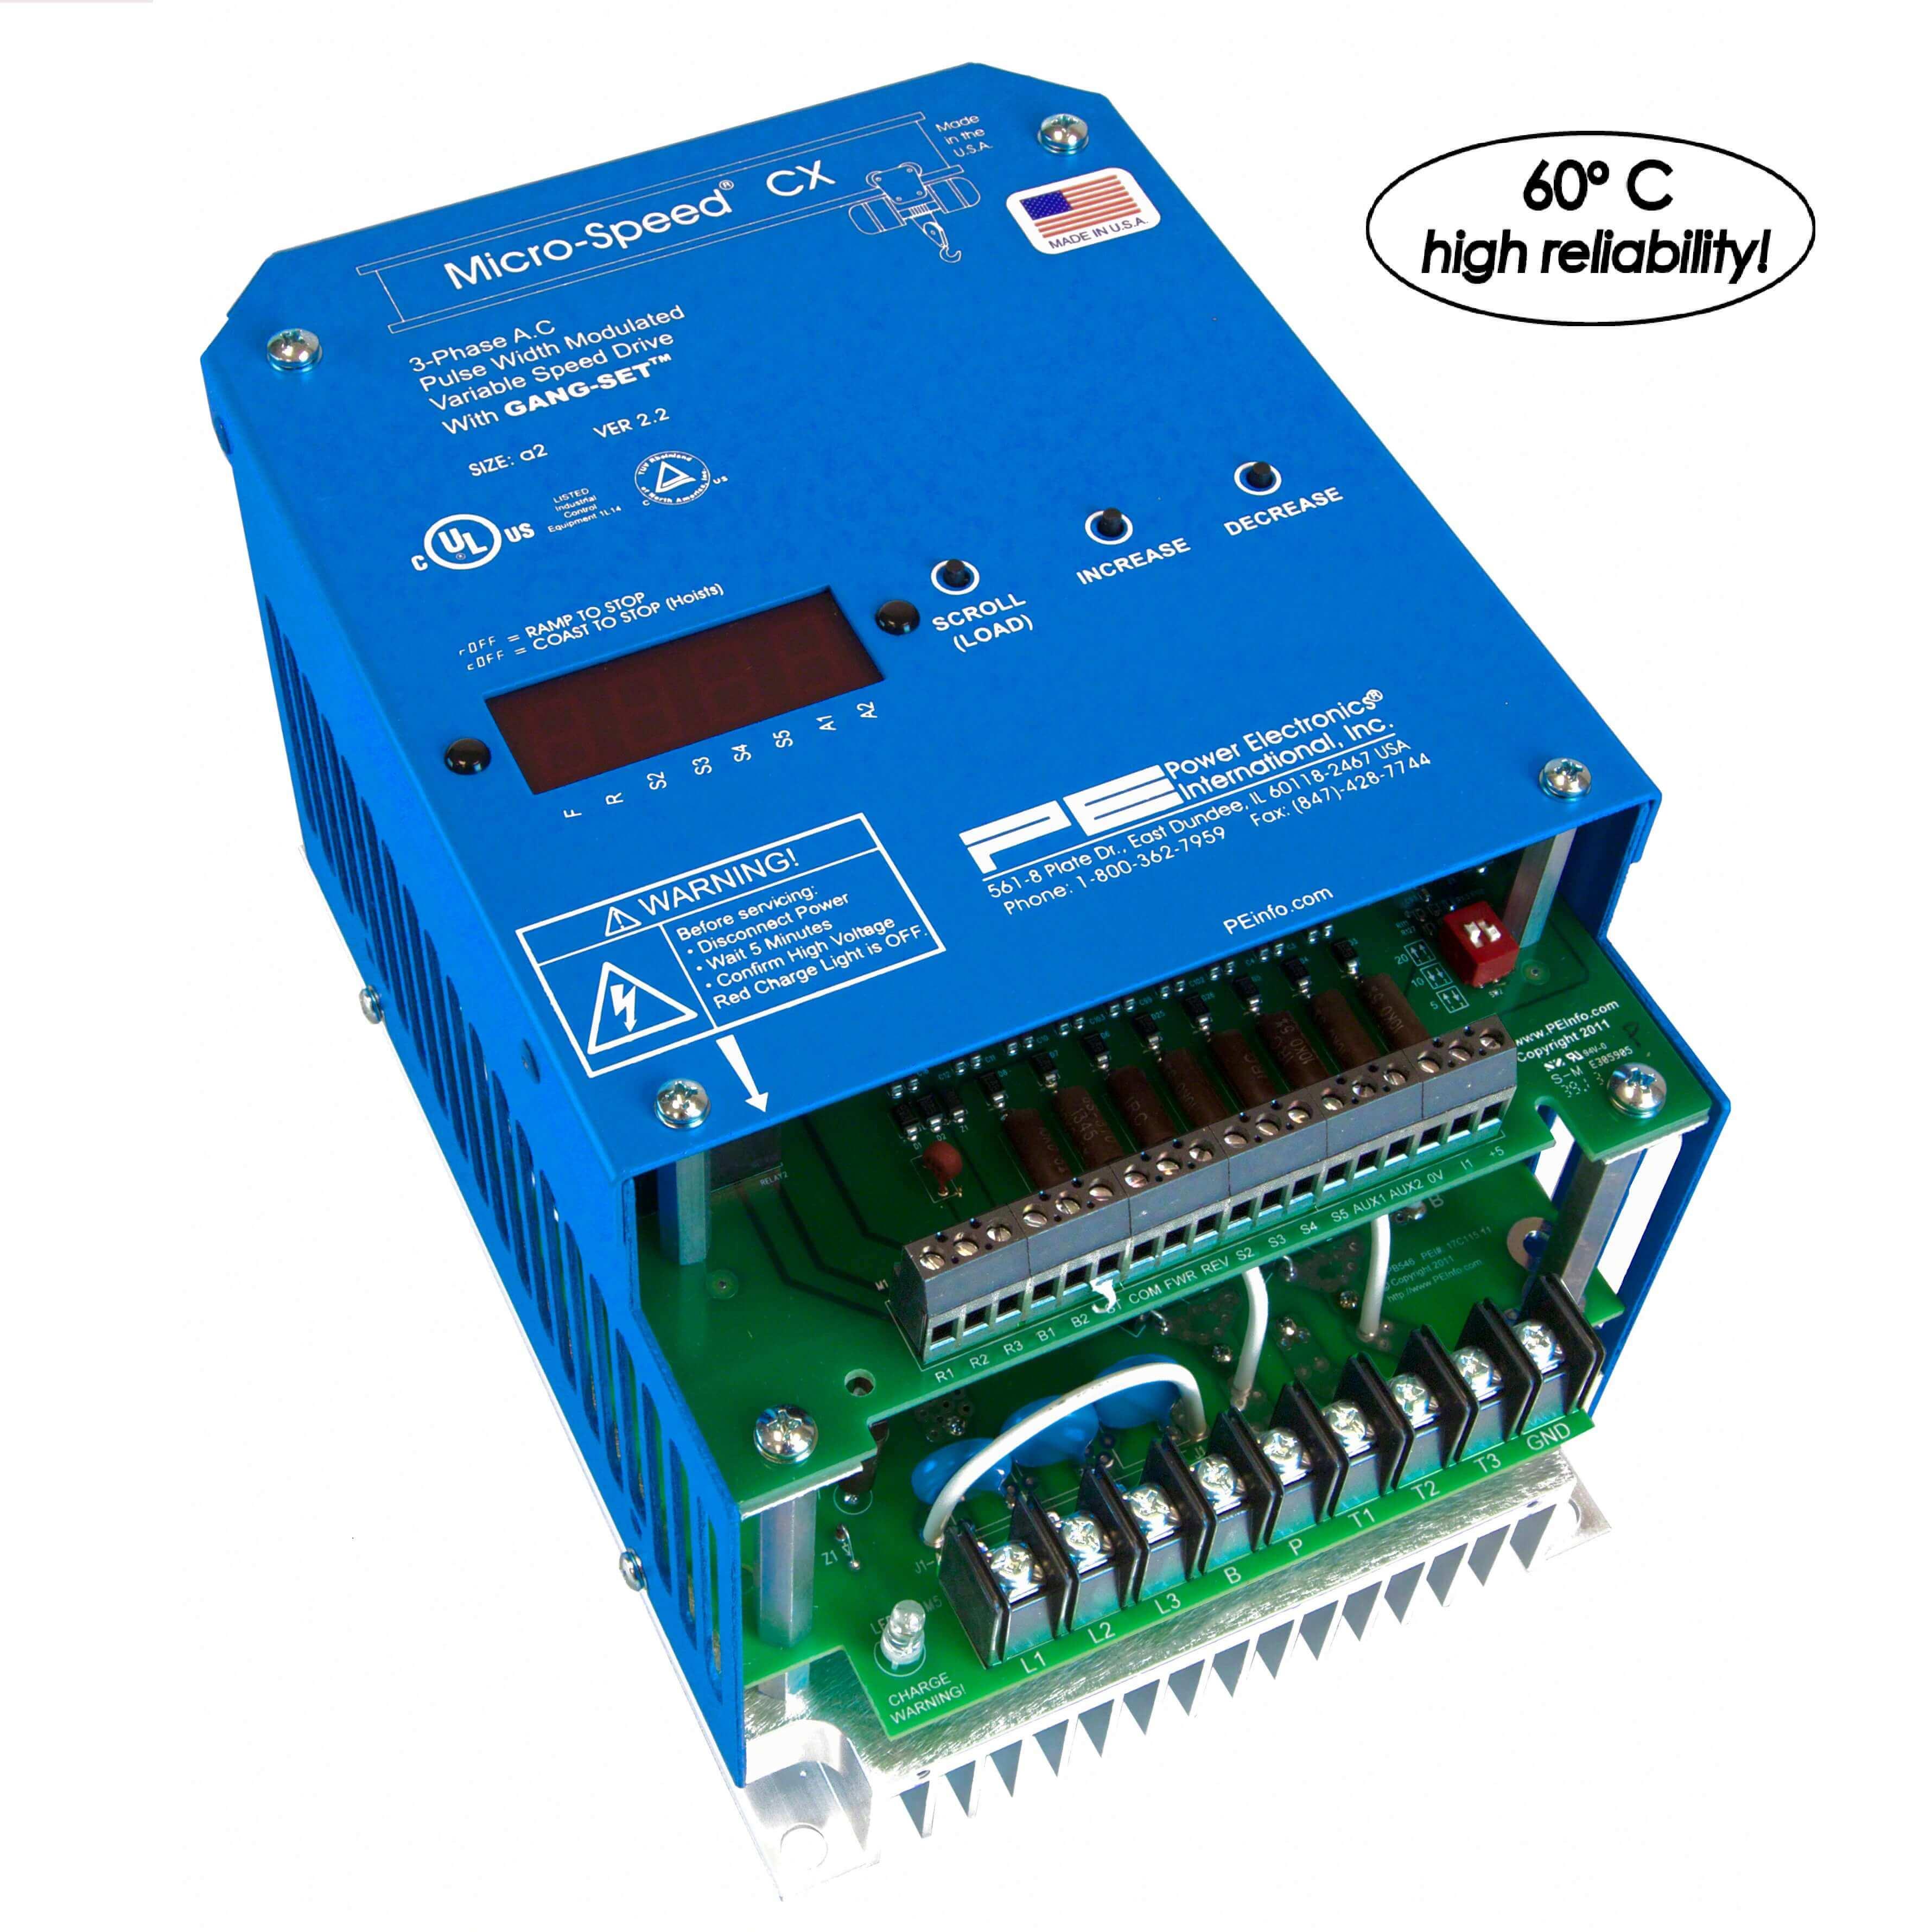 Power Electronics Micro Speed CXR (1-40HP)